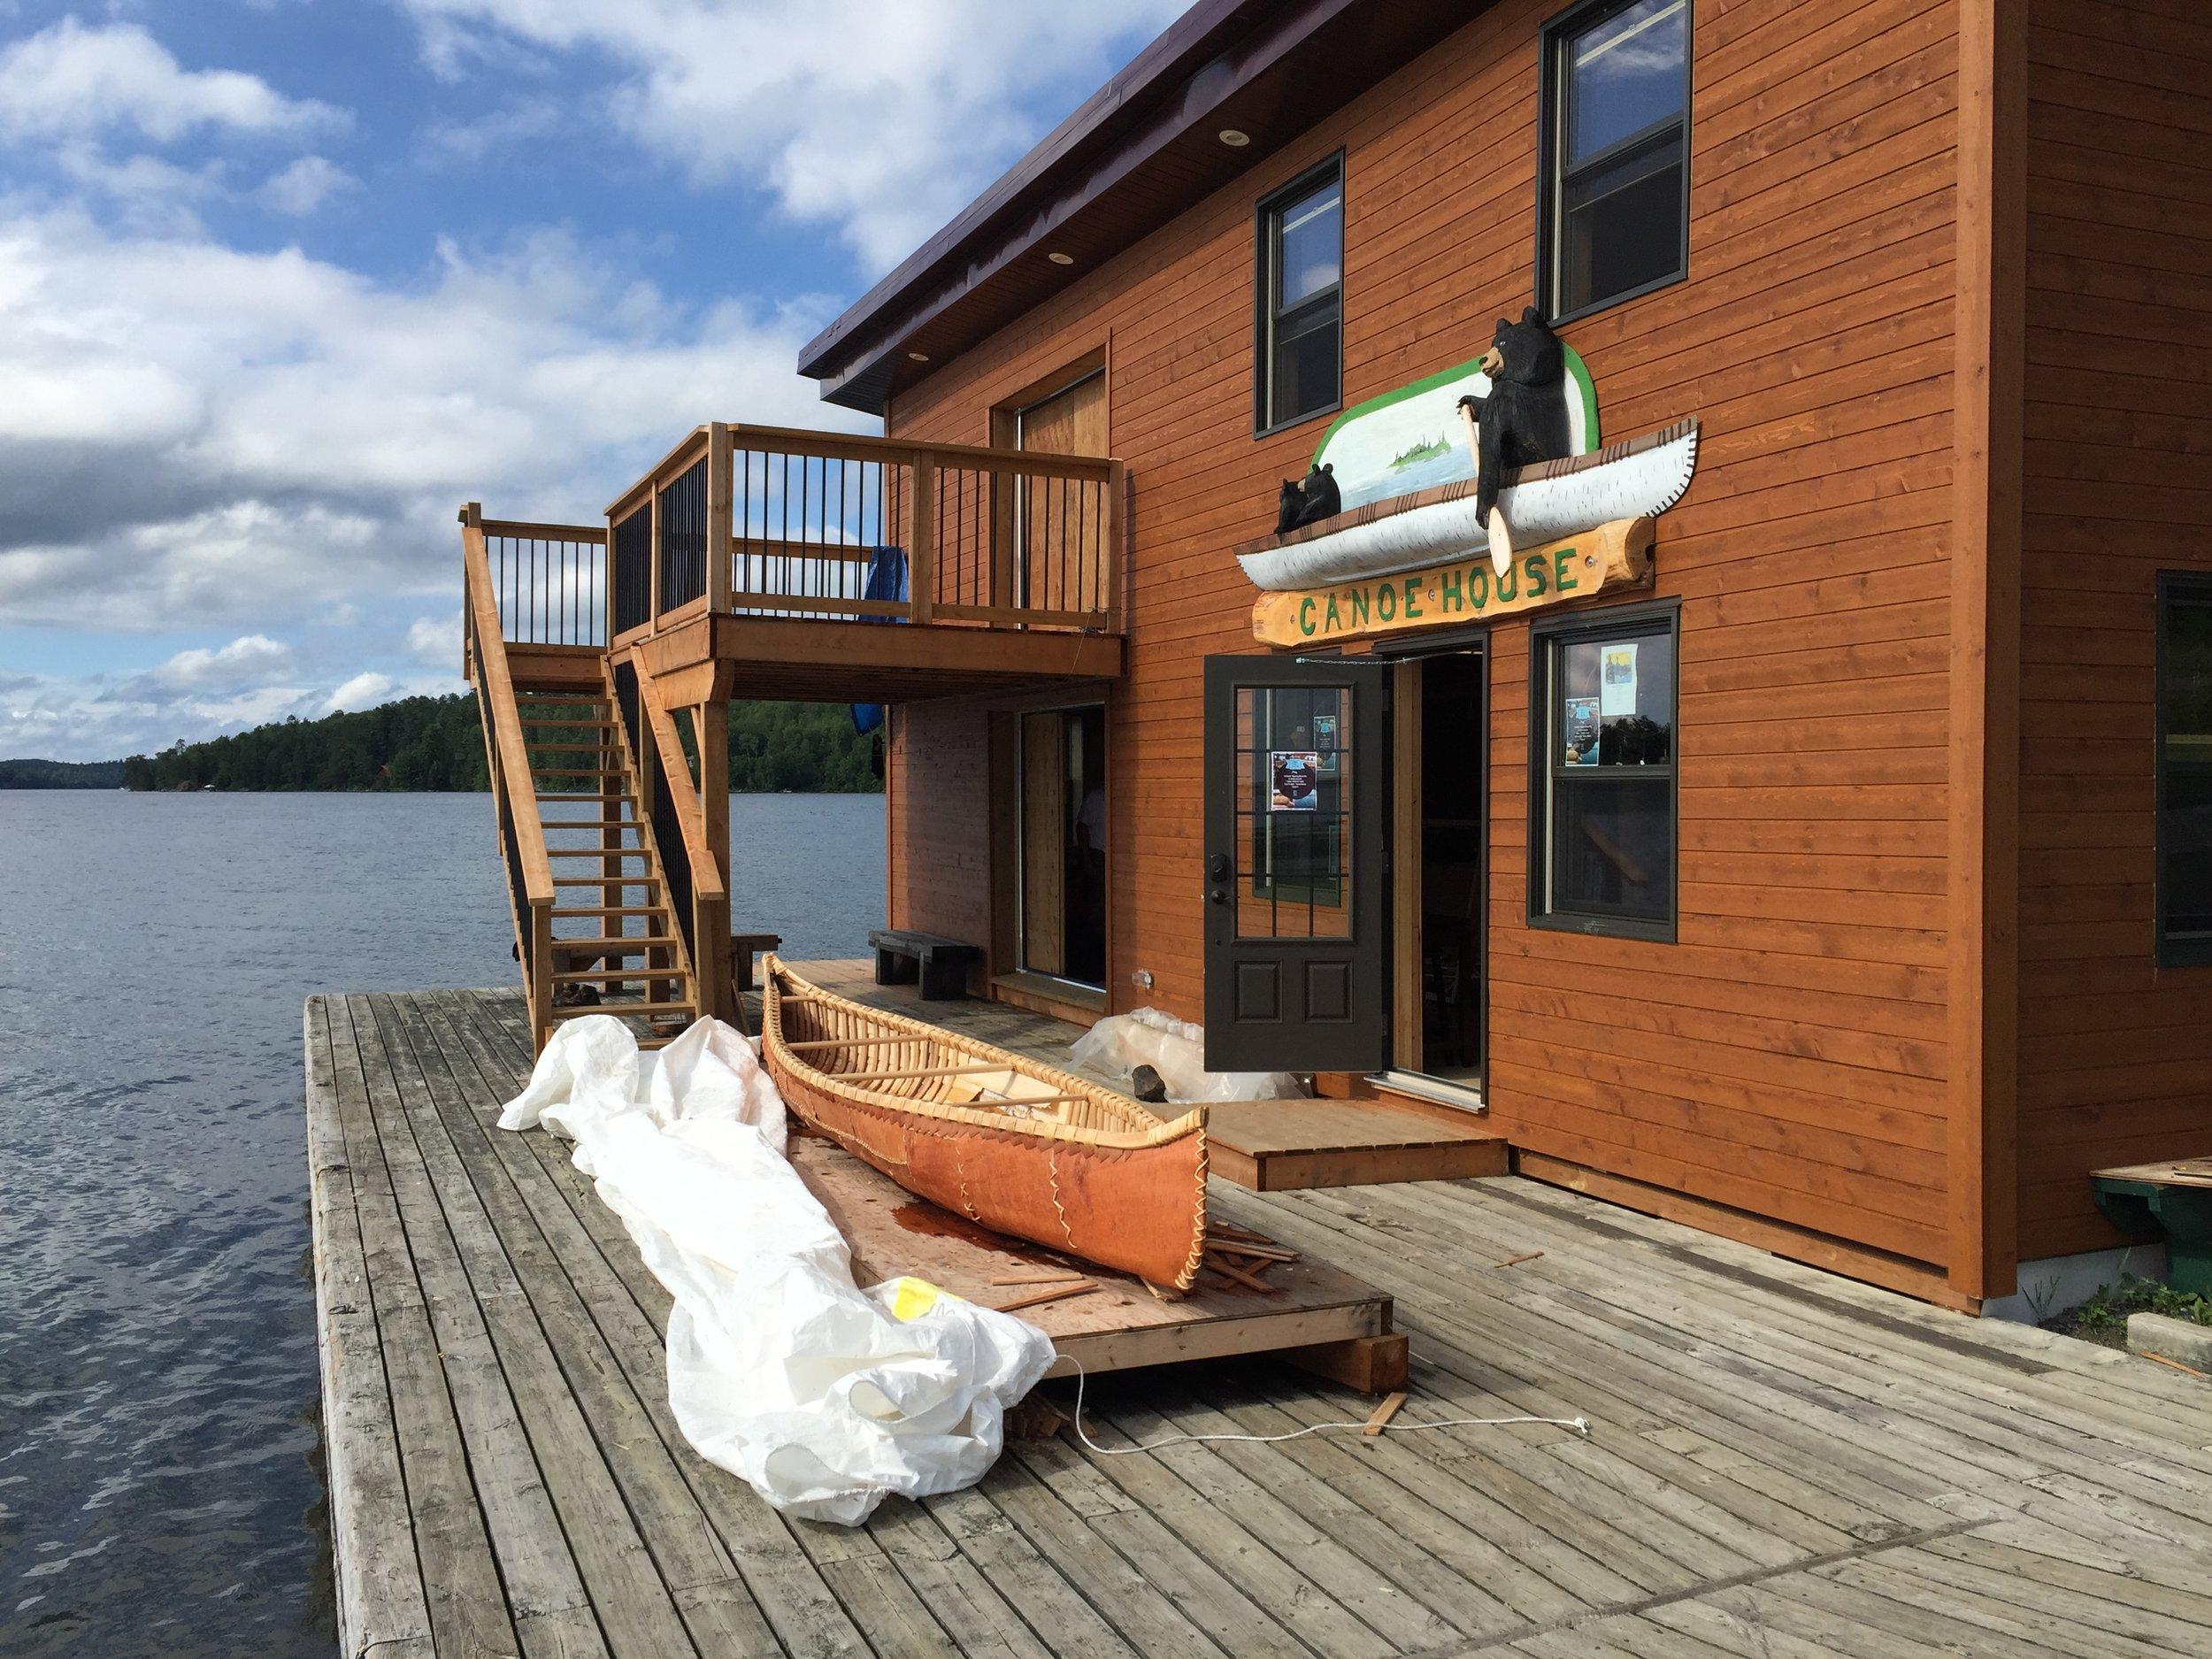 The canoe house with a birch bark canoe in progress